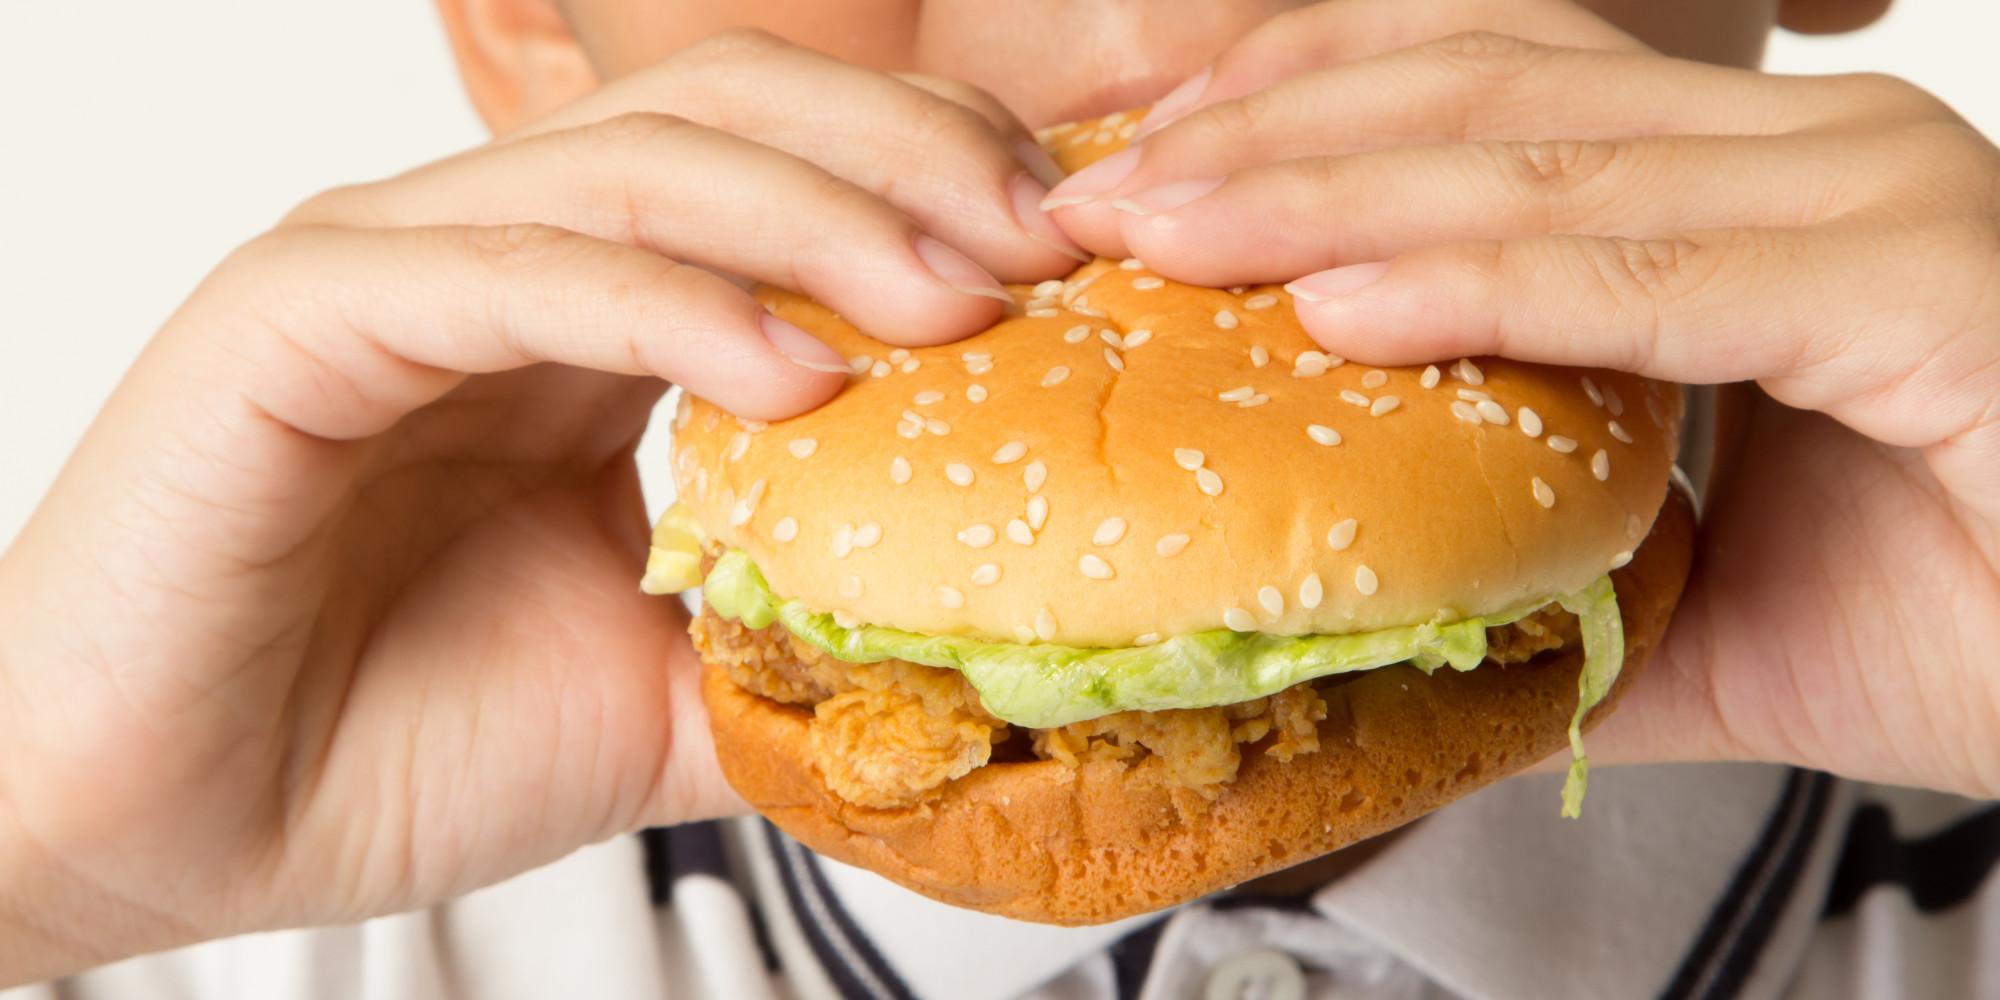 Fast Food Causing Obesity Essay